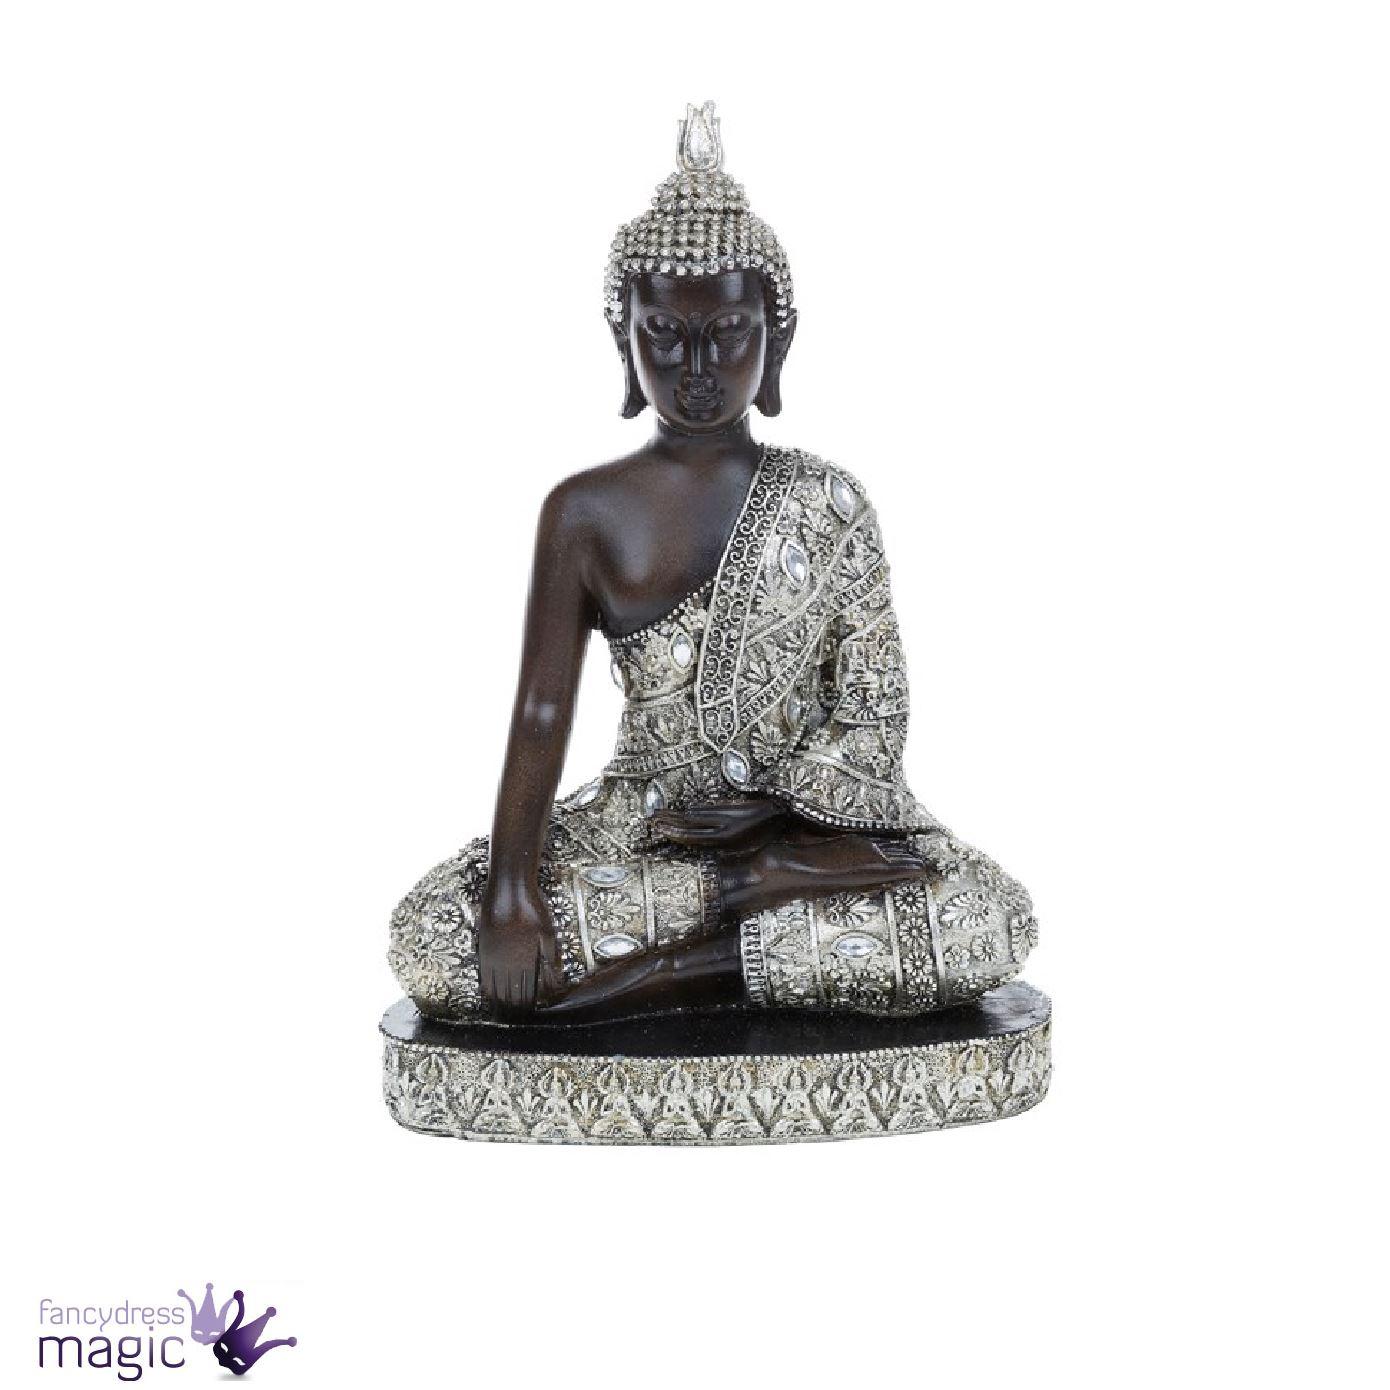 tha bouddha statue assis genoux debout feng shui argent figurine d coration ebay. Black Bedroom Furniture Sets. Home Design Ideas